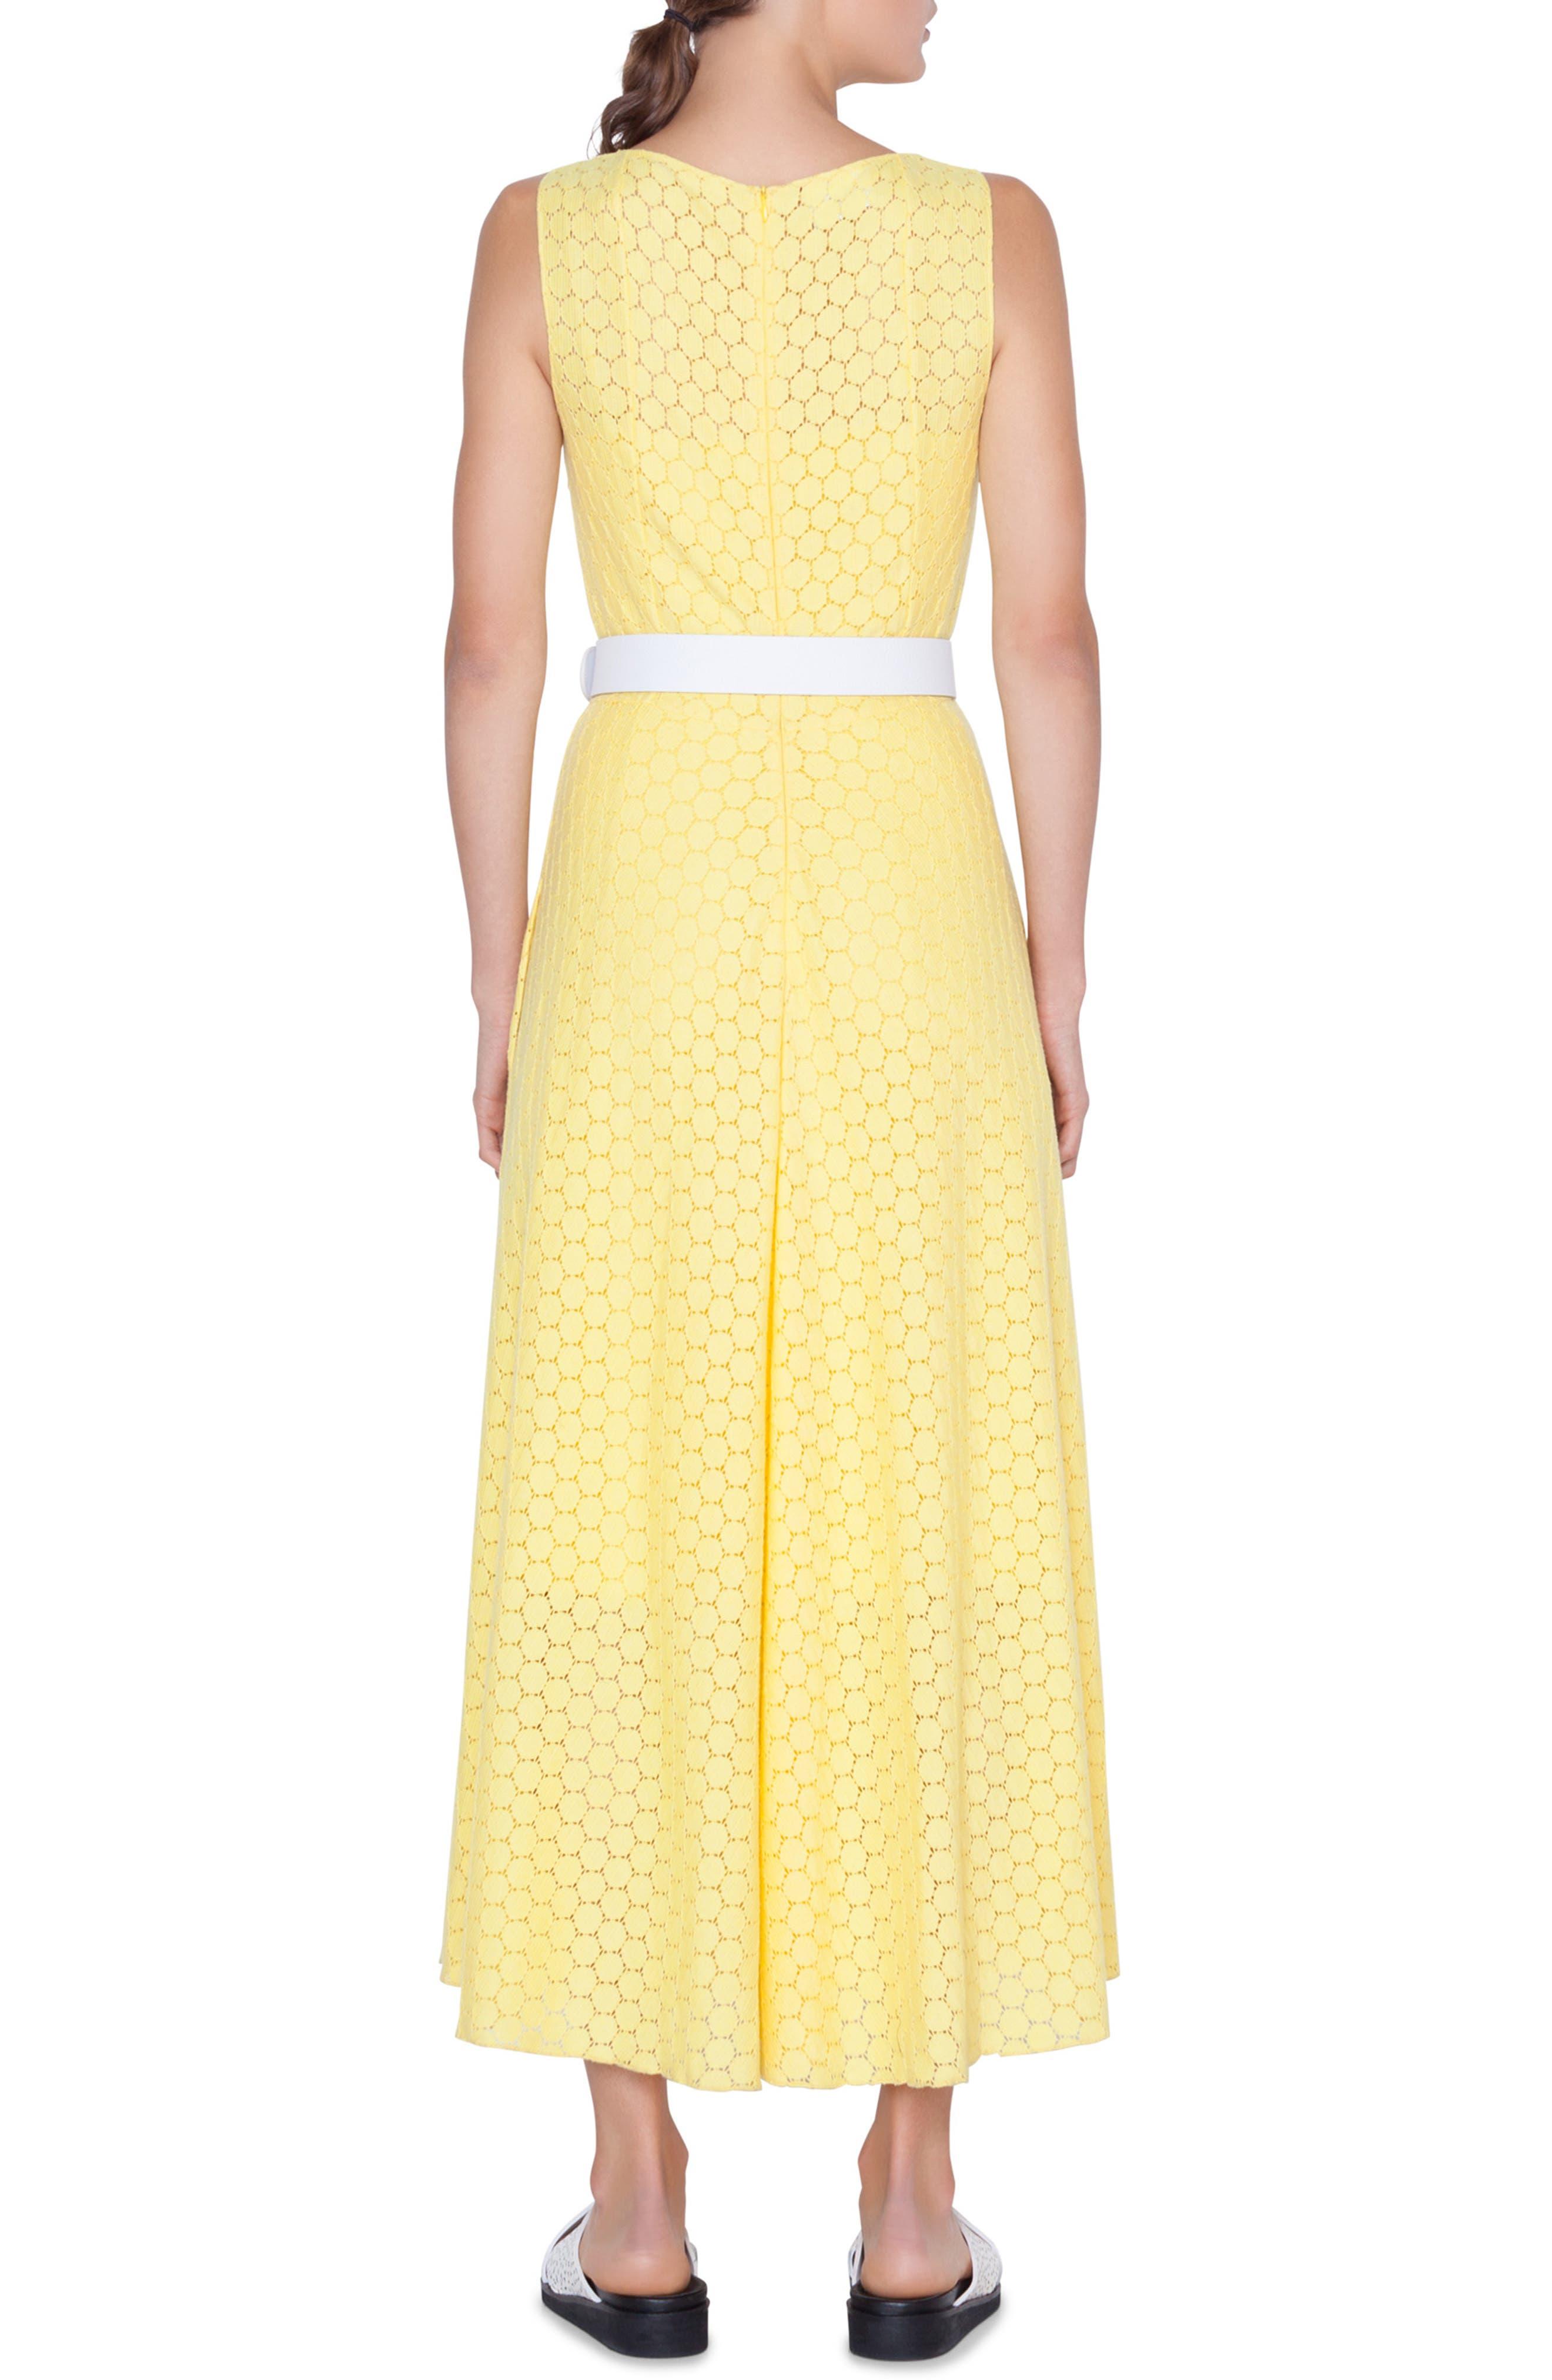 AKRIS PUNTO,                             Belted Lace Dress,                             Alternate thumbnail 2, color,                             LIMONE